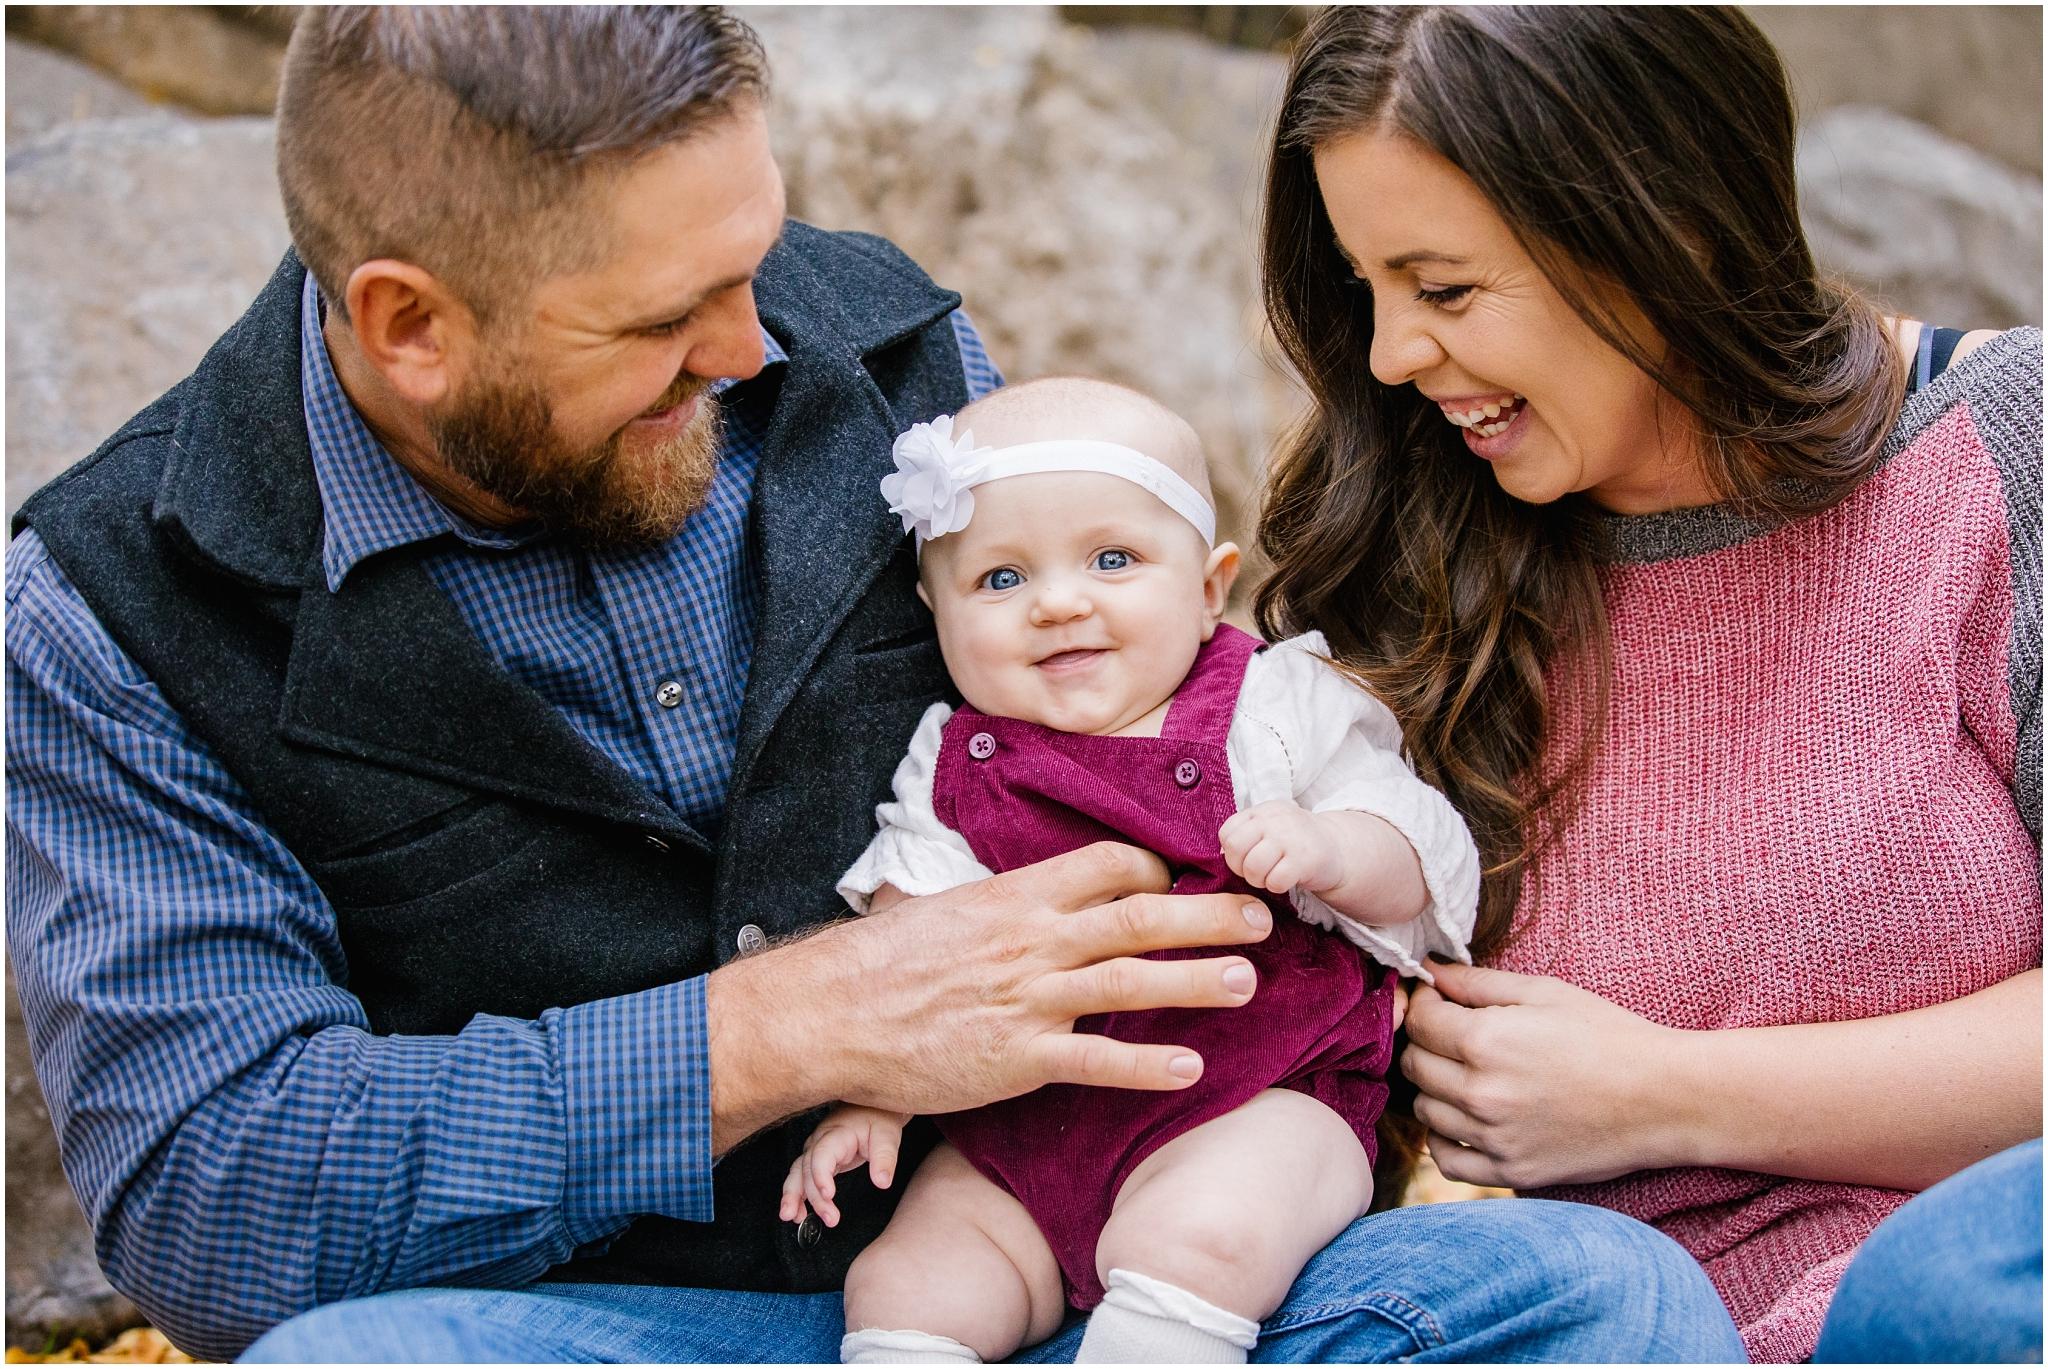 Matthews-14_Lizzie-B-Imagery-Utah-Family-Photographer-Central-Utah-Photographer-Utah-County-Nephi-Utah.jpg